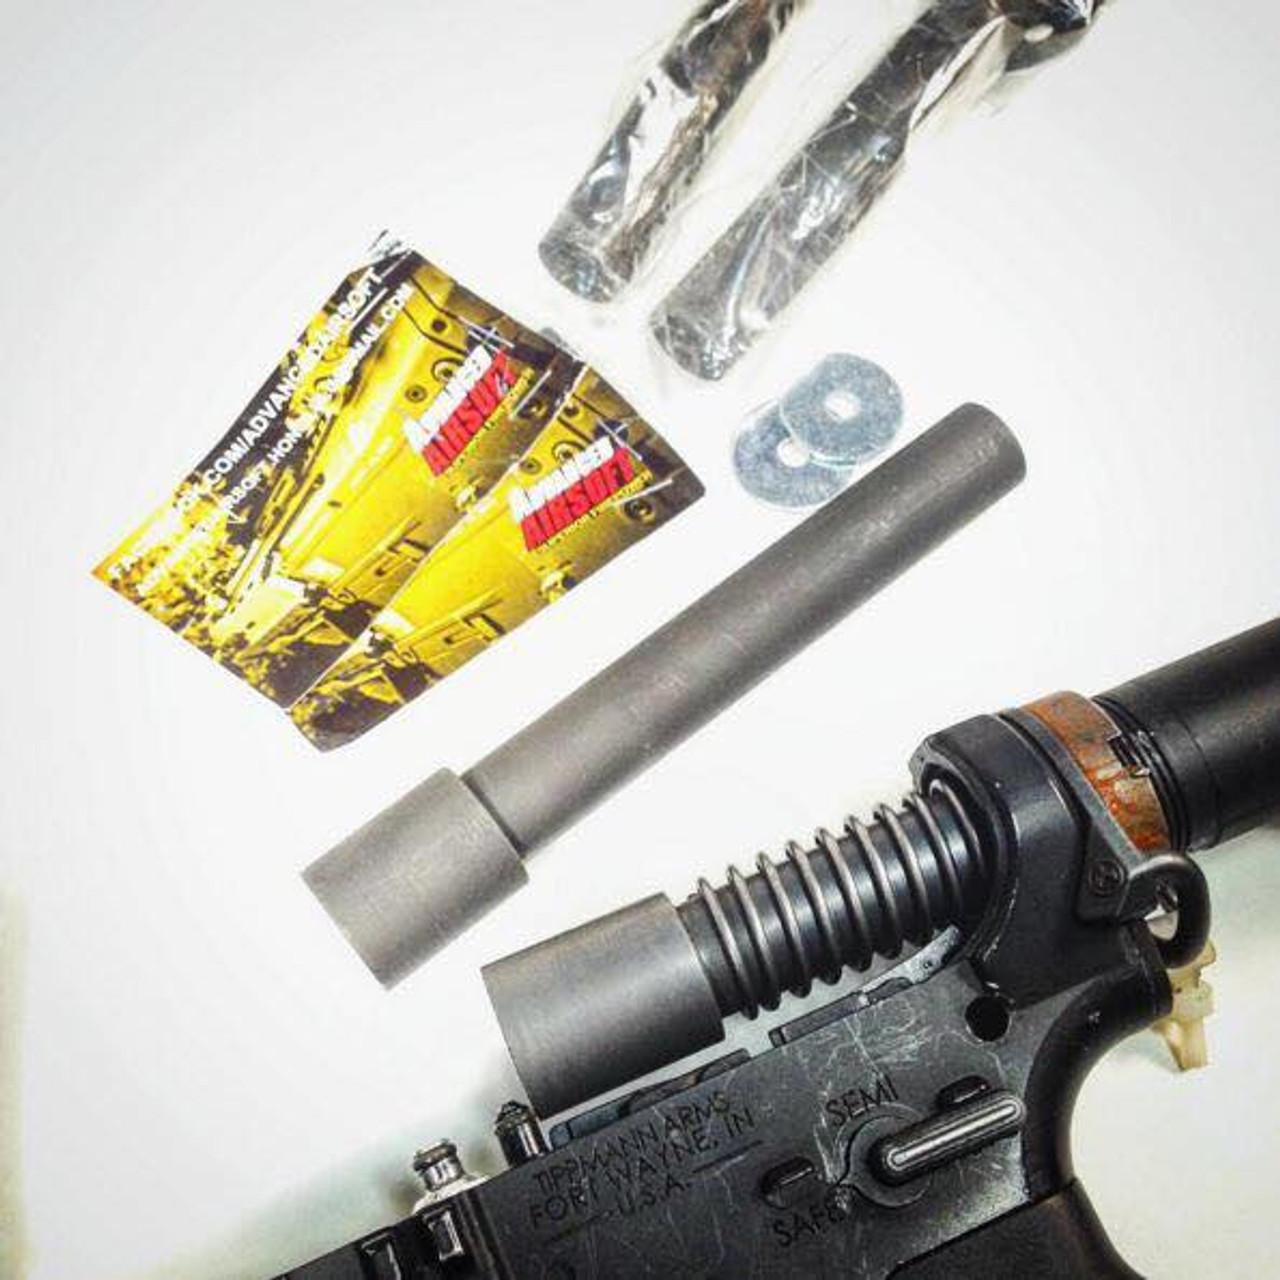 Advanced Airsoft - Tippmann HEAVY BOLT recoil system